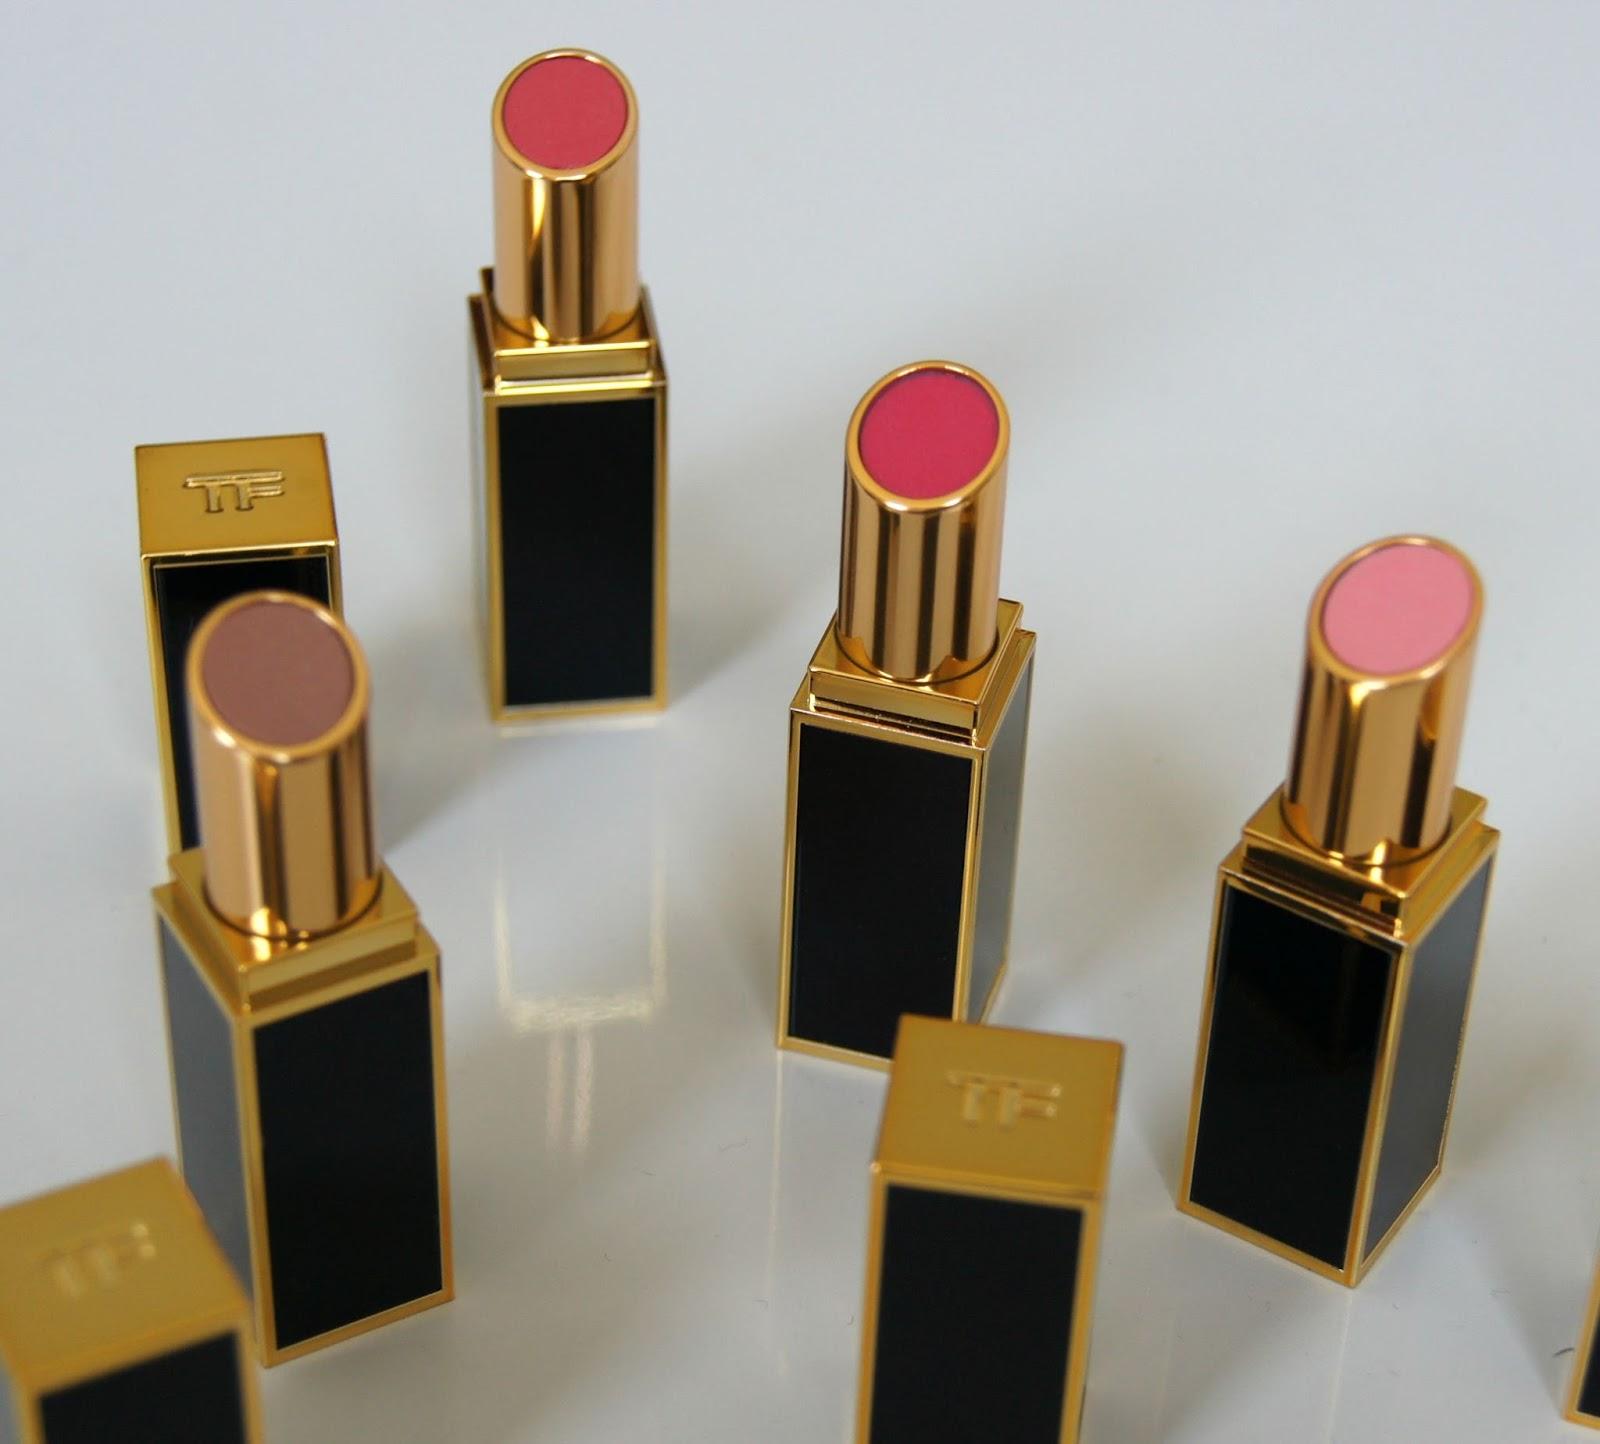 Tom Ford Lip Colour Shine review